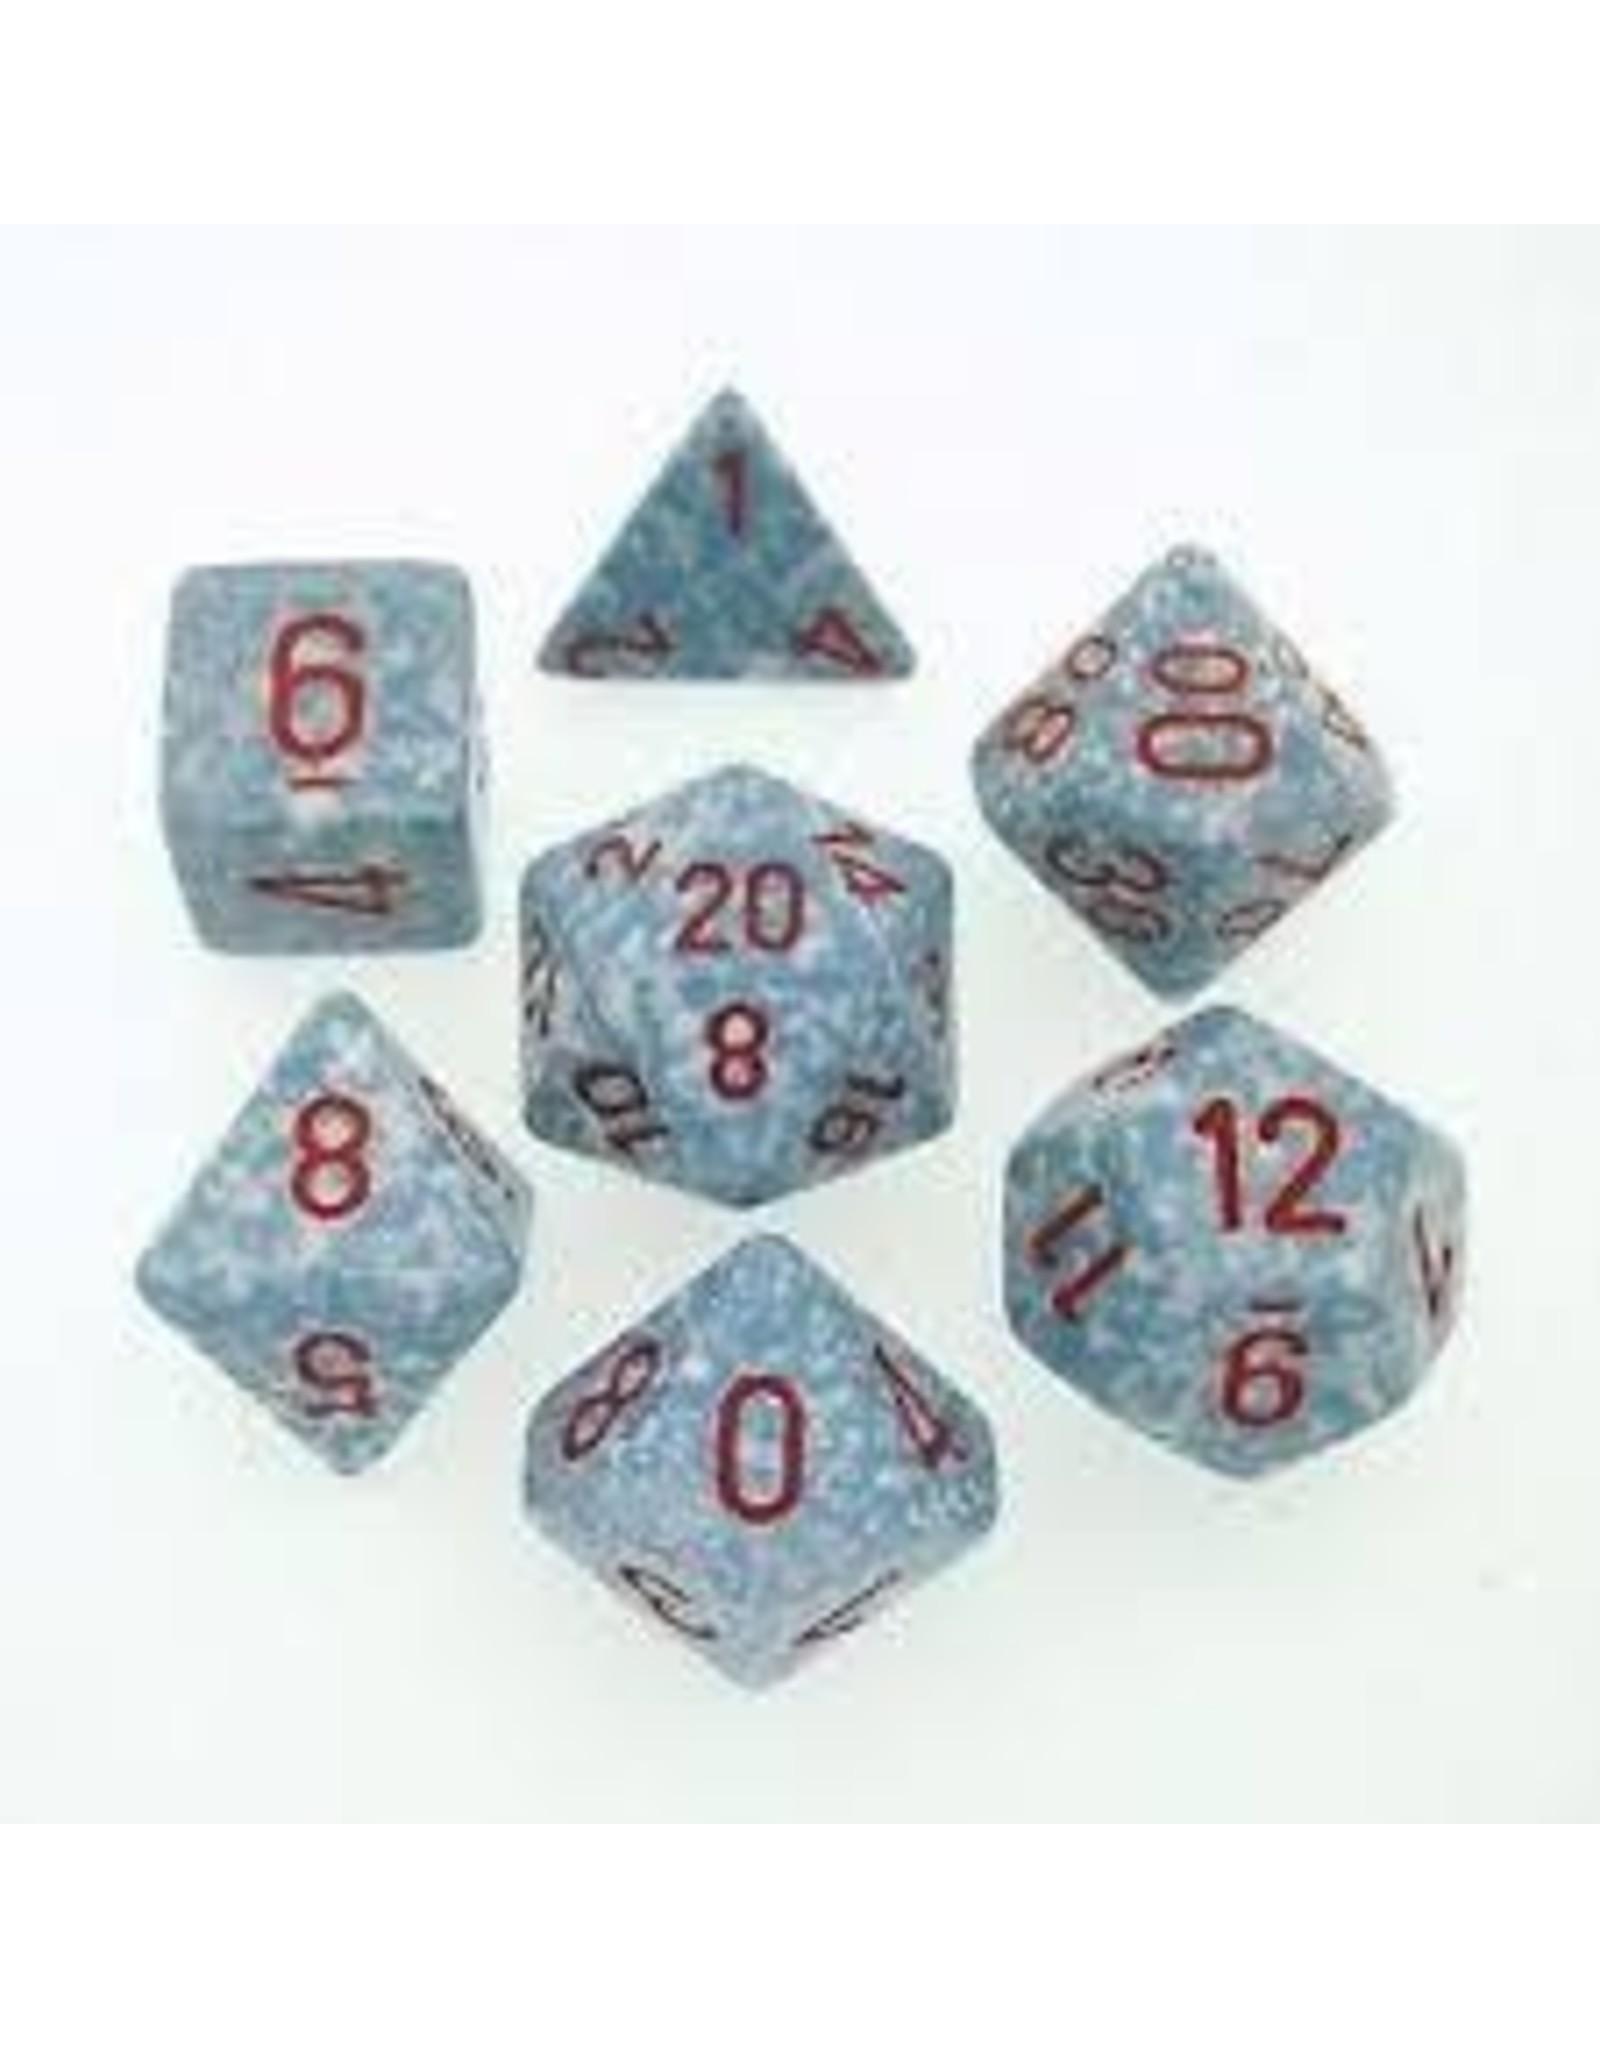 Chessex 7-Set Polyhedral CubeSP Air